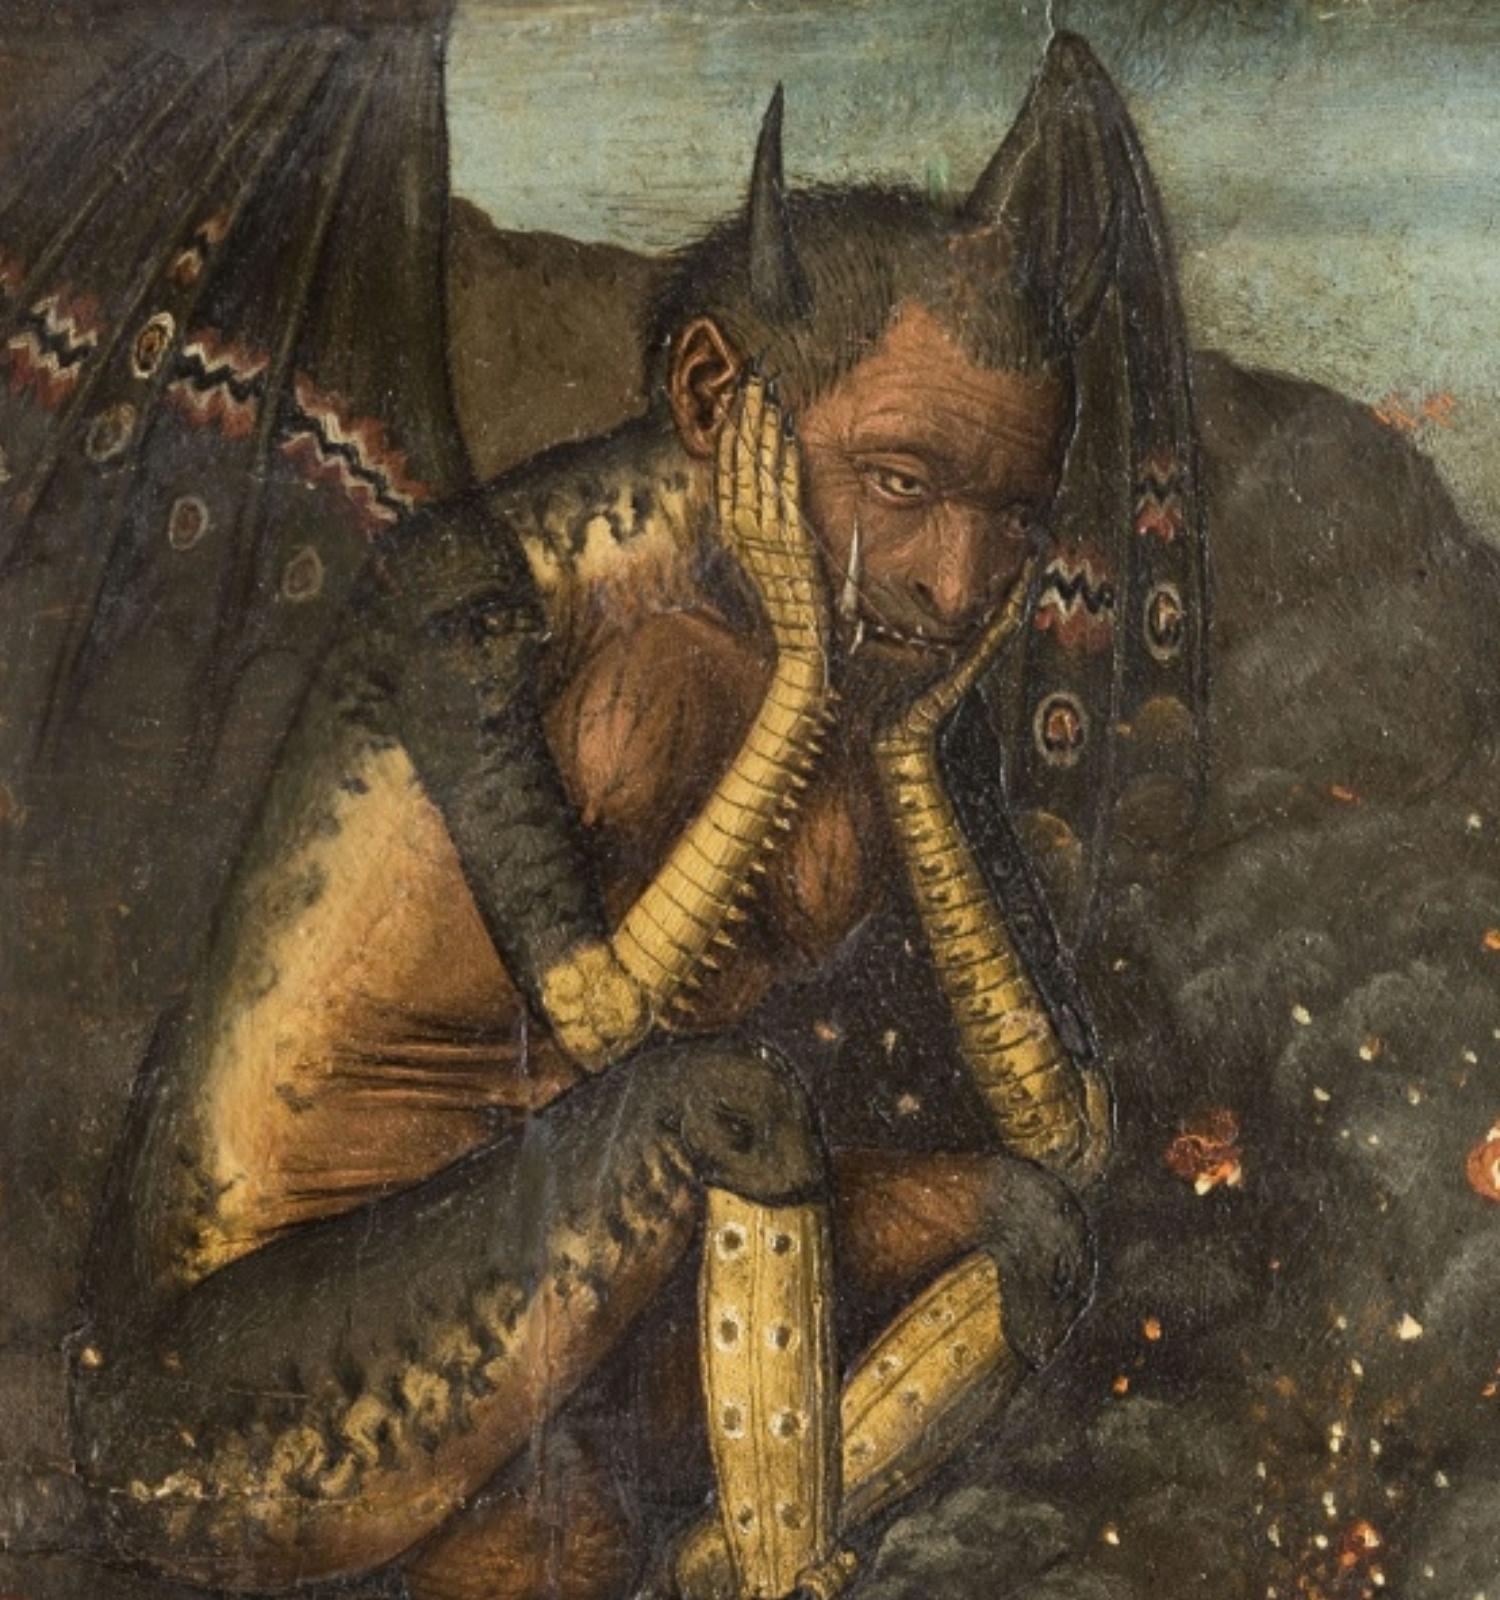 Descenso de Cristo al Limbo (detalle), Bartolomé Bermejo, hacia 1475